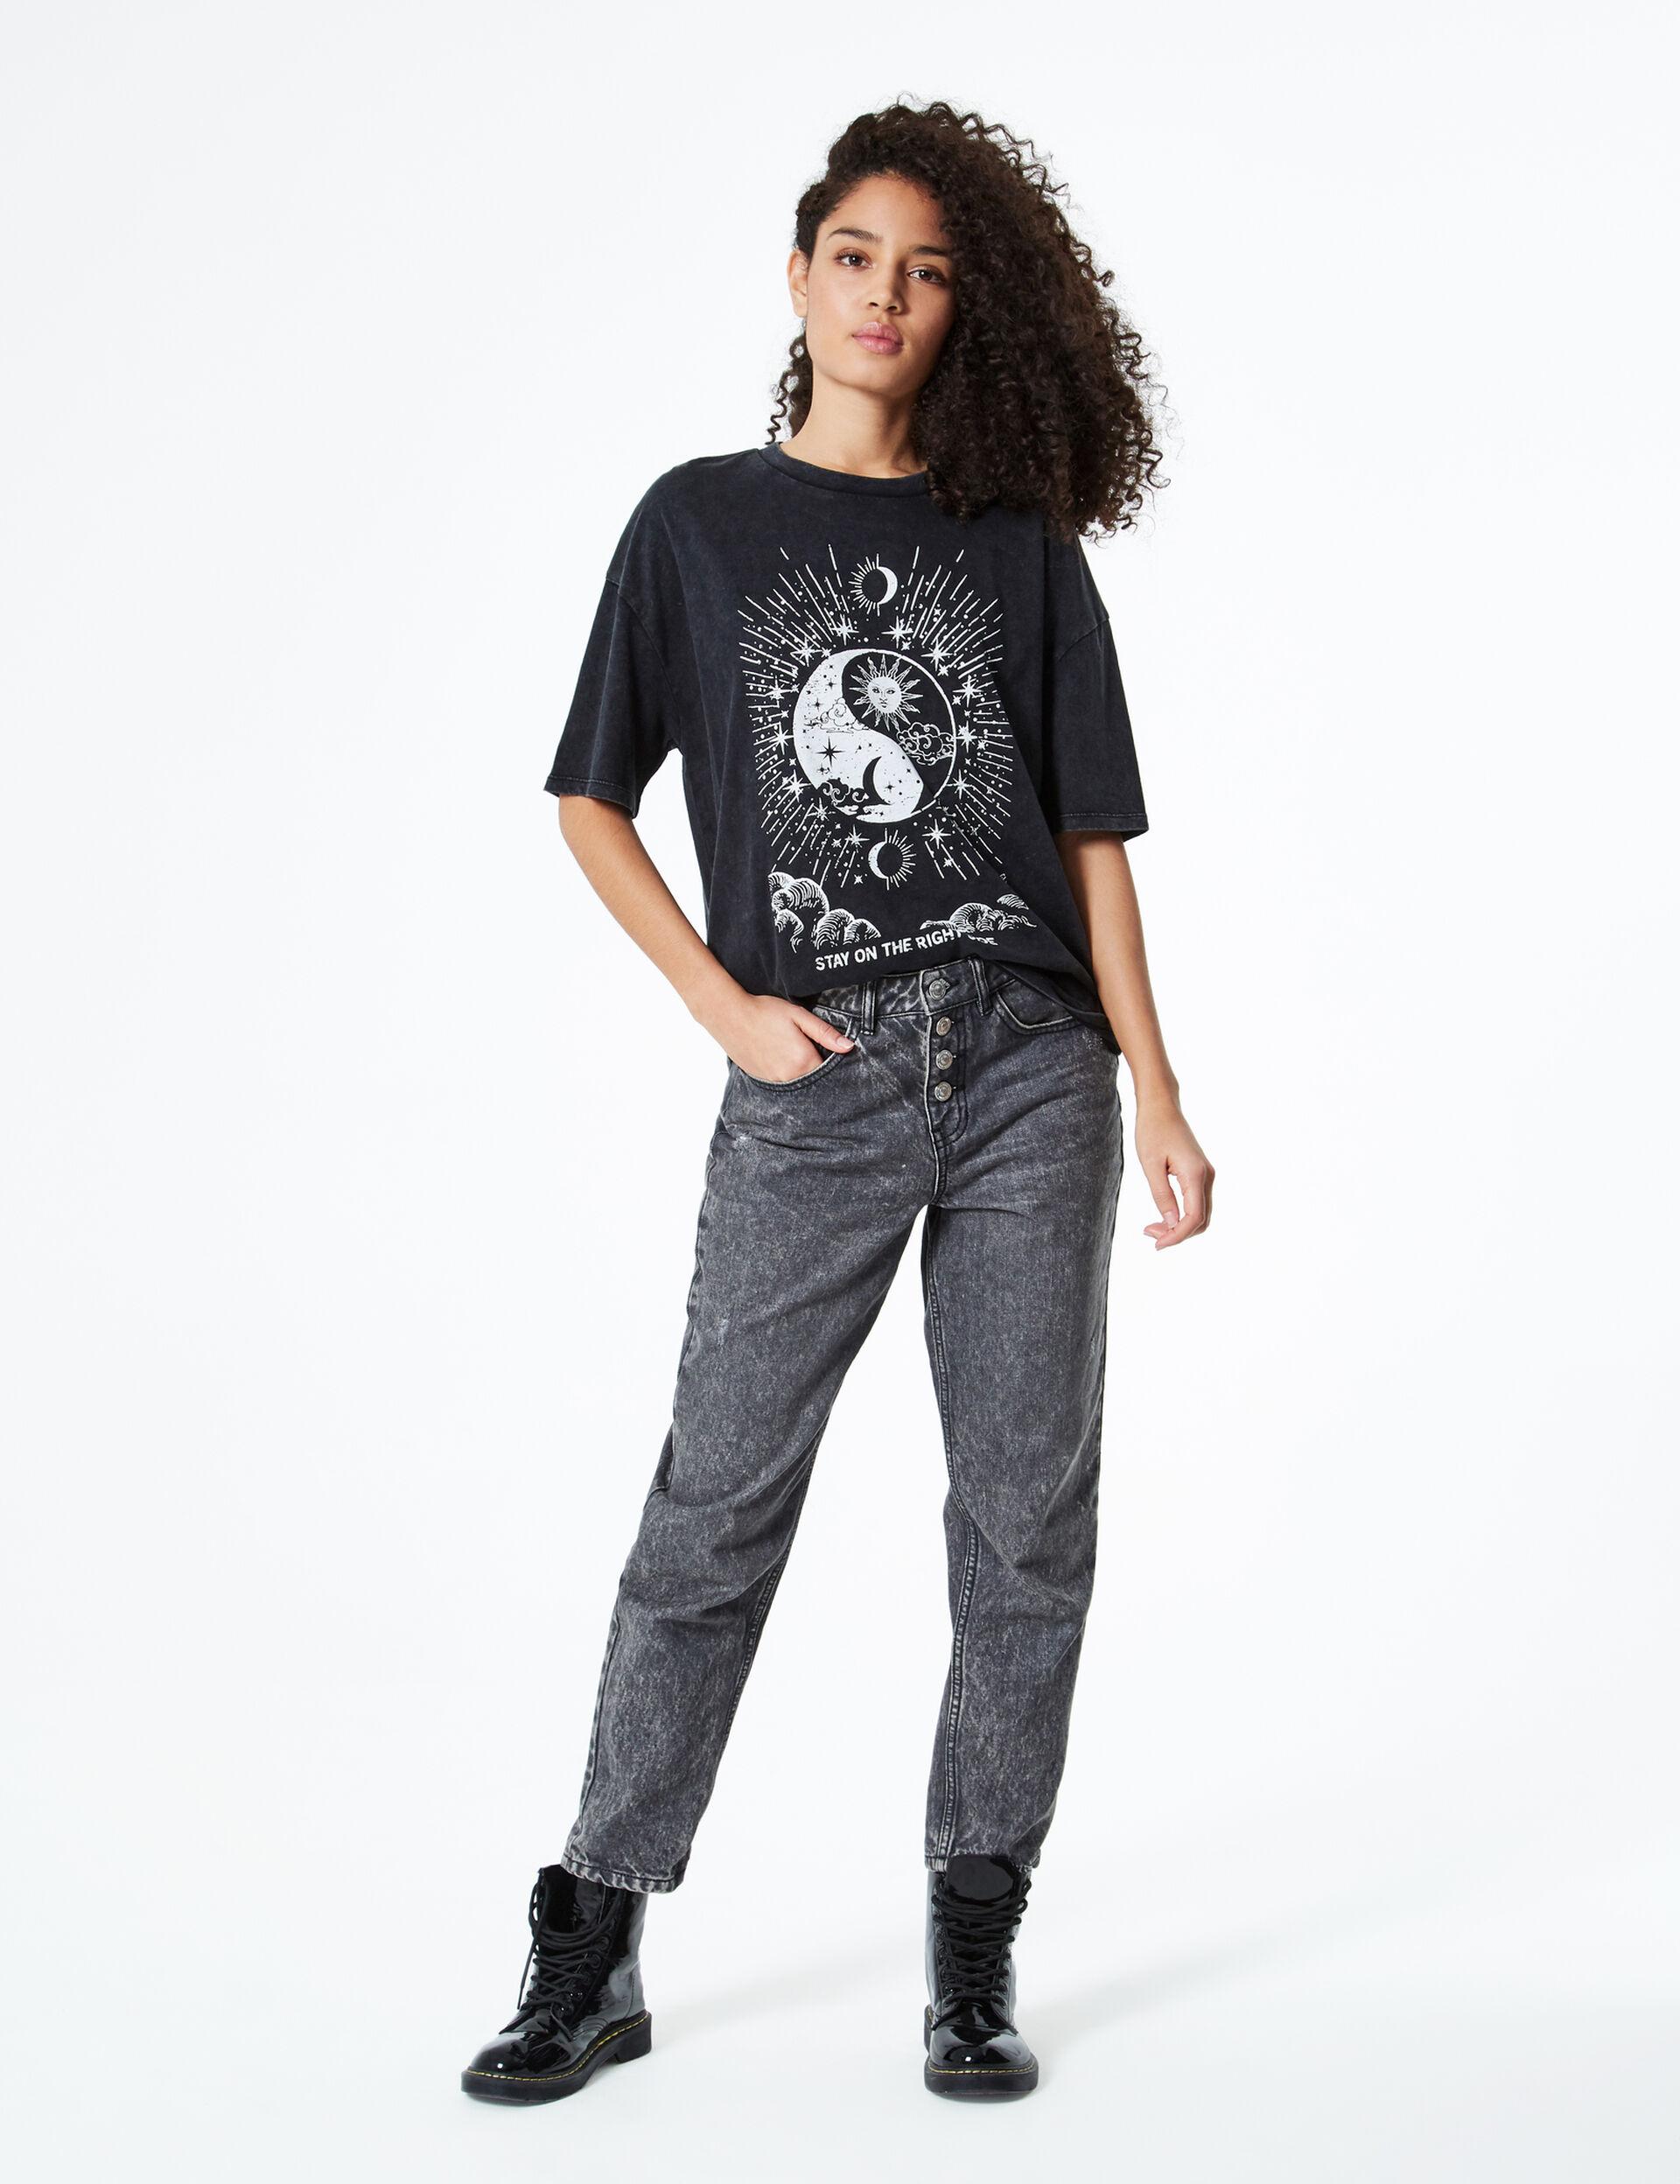 Astral motif T-shirt